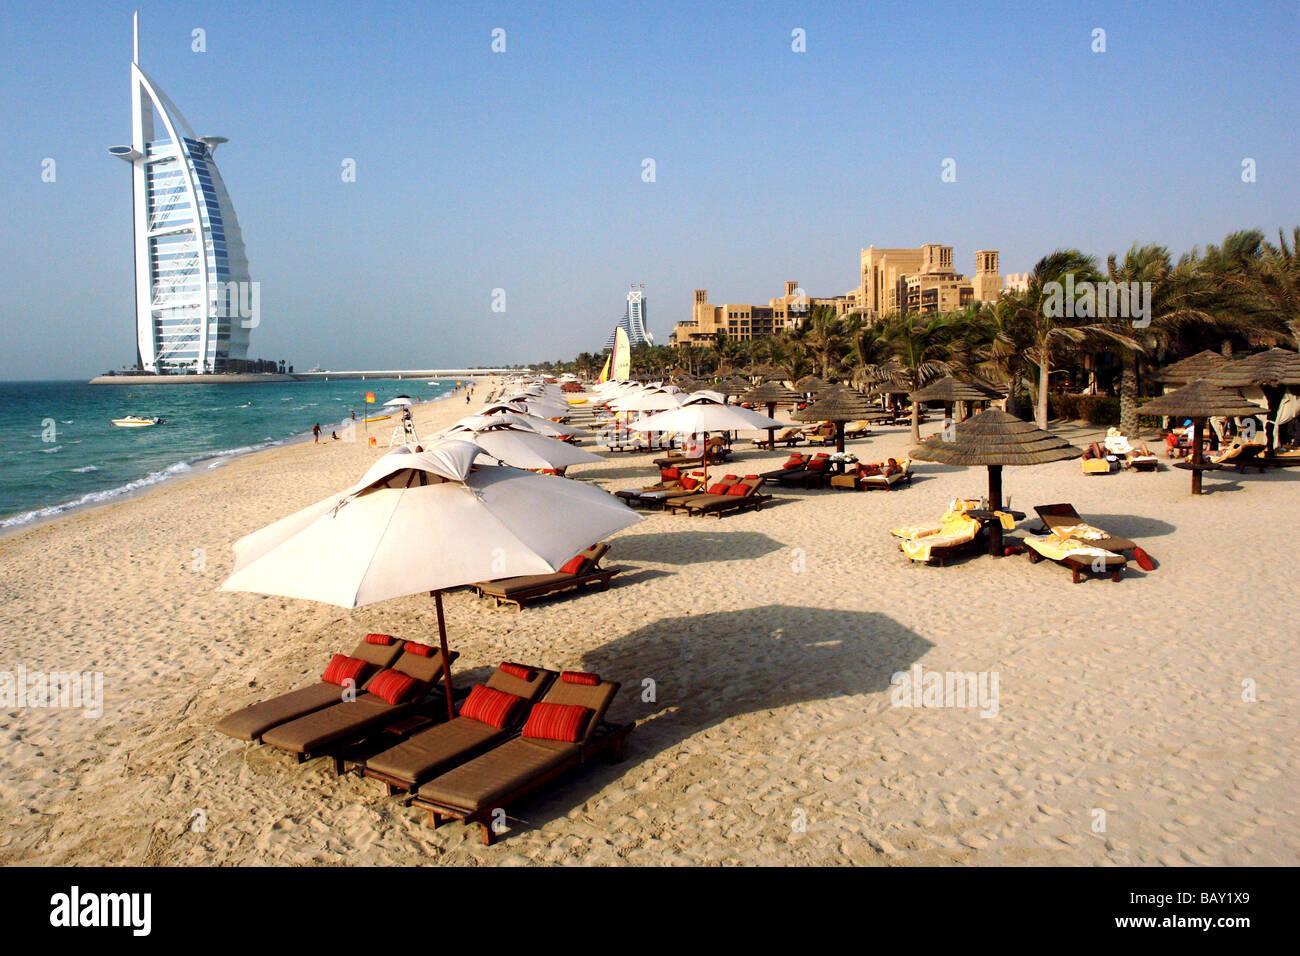 Sun Loungers at Jumeirah Beach, View at Burj al Arab Hotel, Jumeirah District, Dubai, United Arab Emirates, UAE - Stock Image